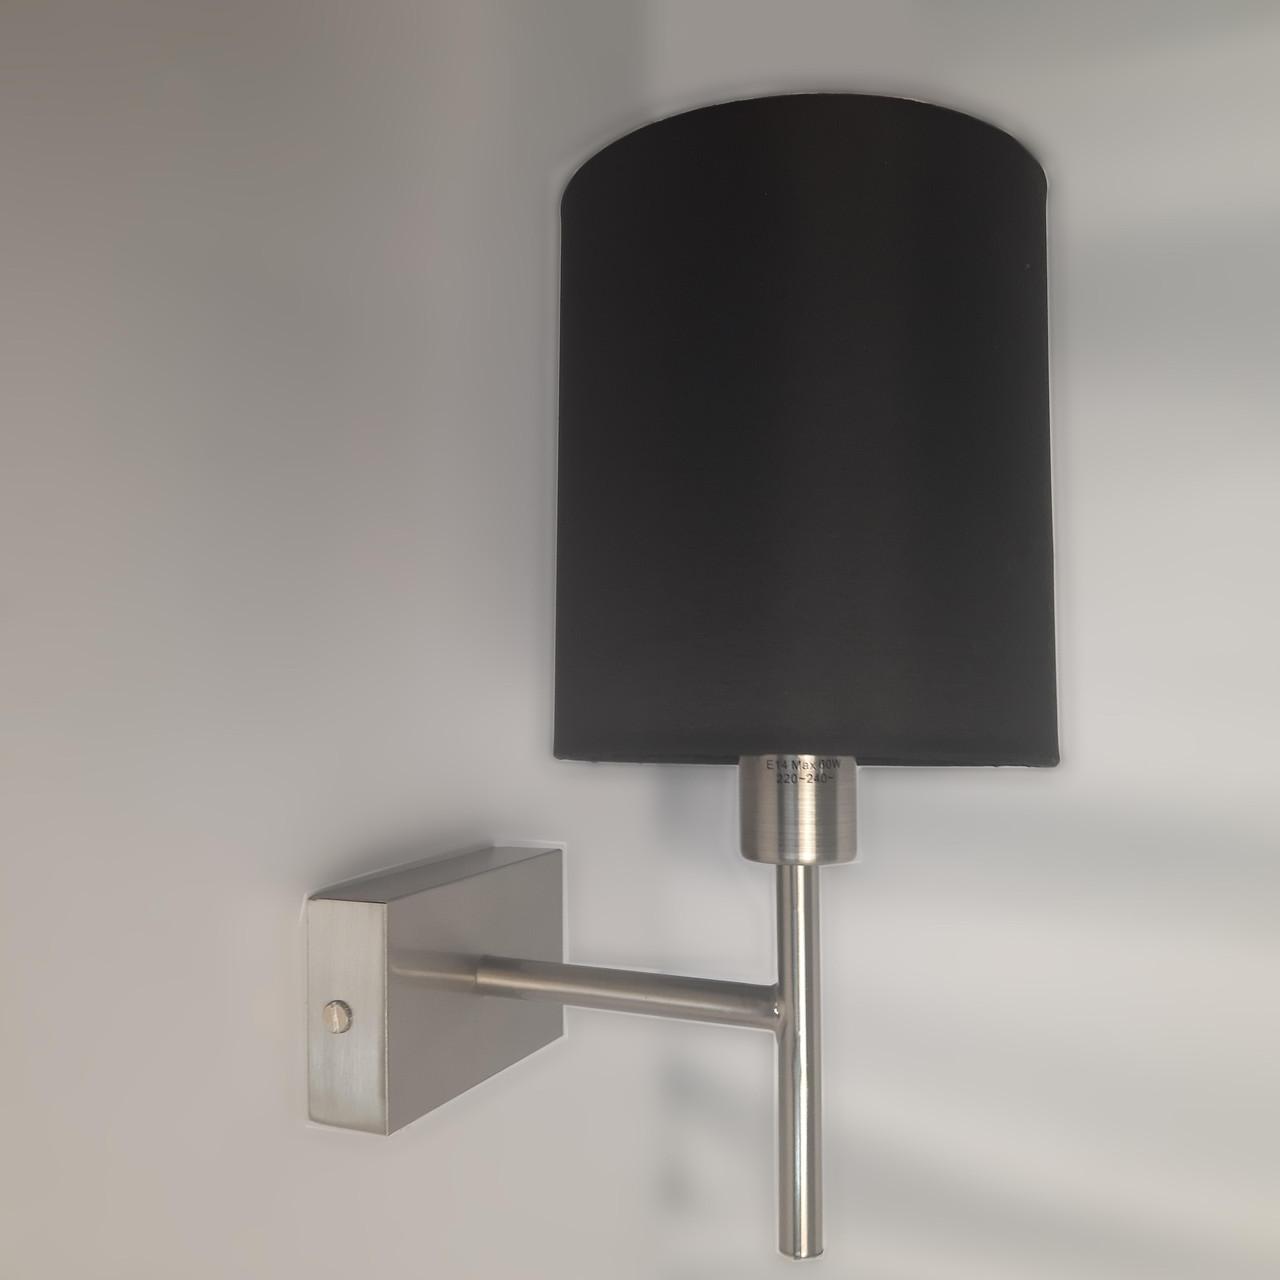 Бра на 1 лампу 29-F7704/1Z BK